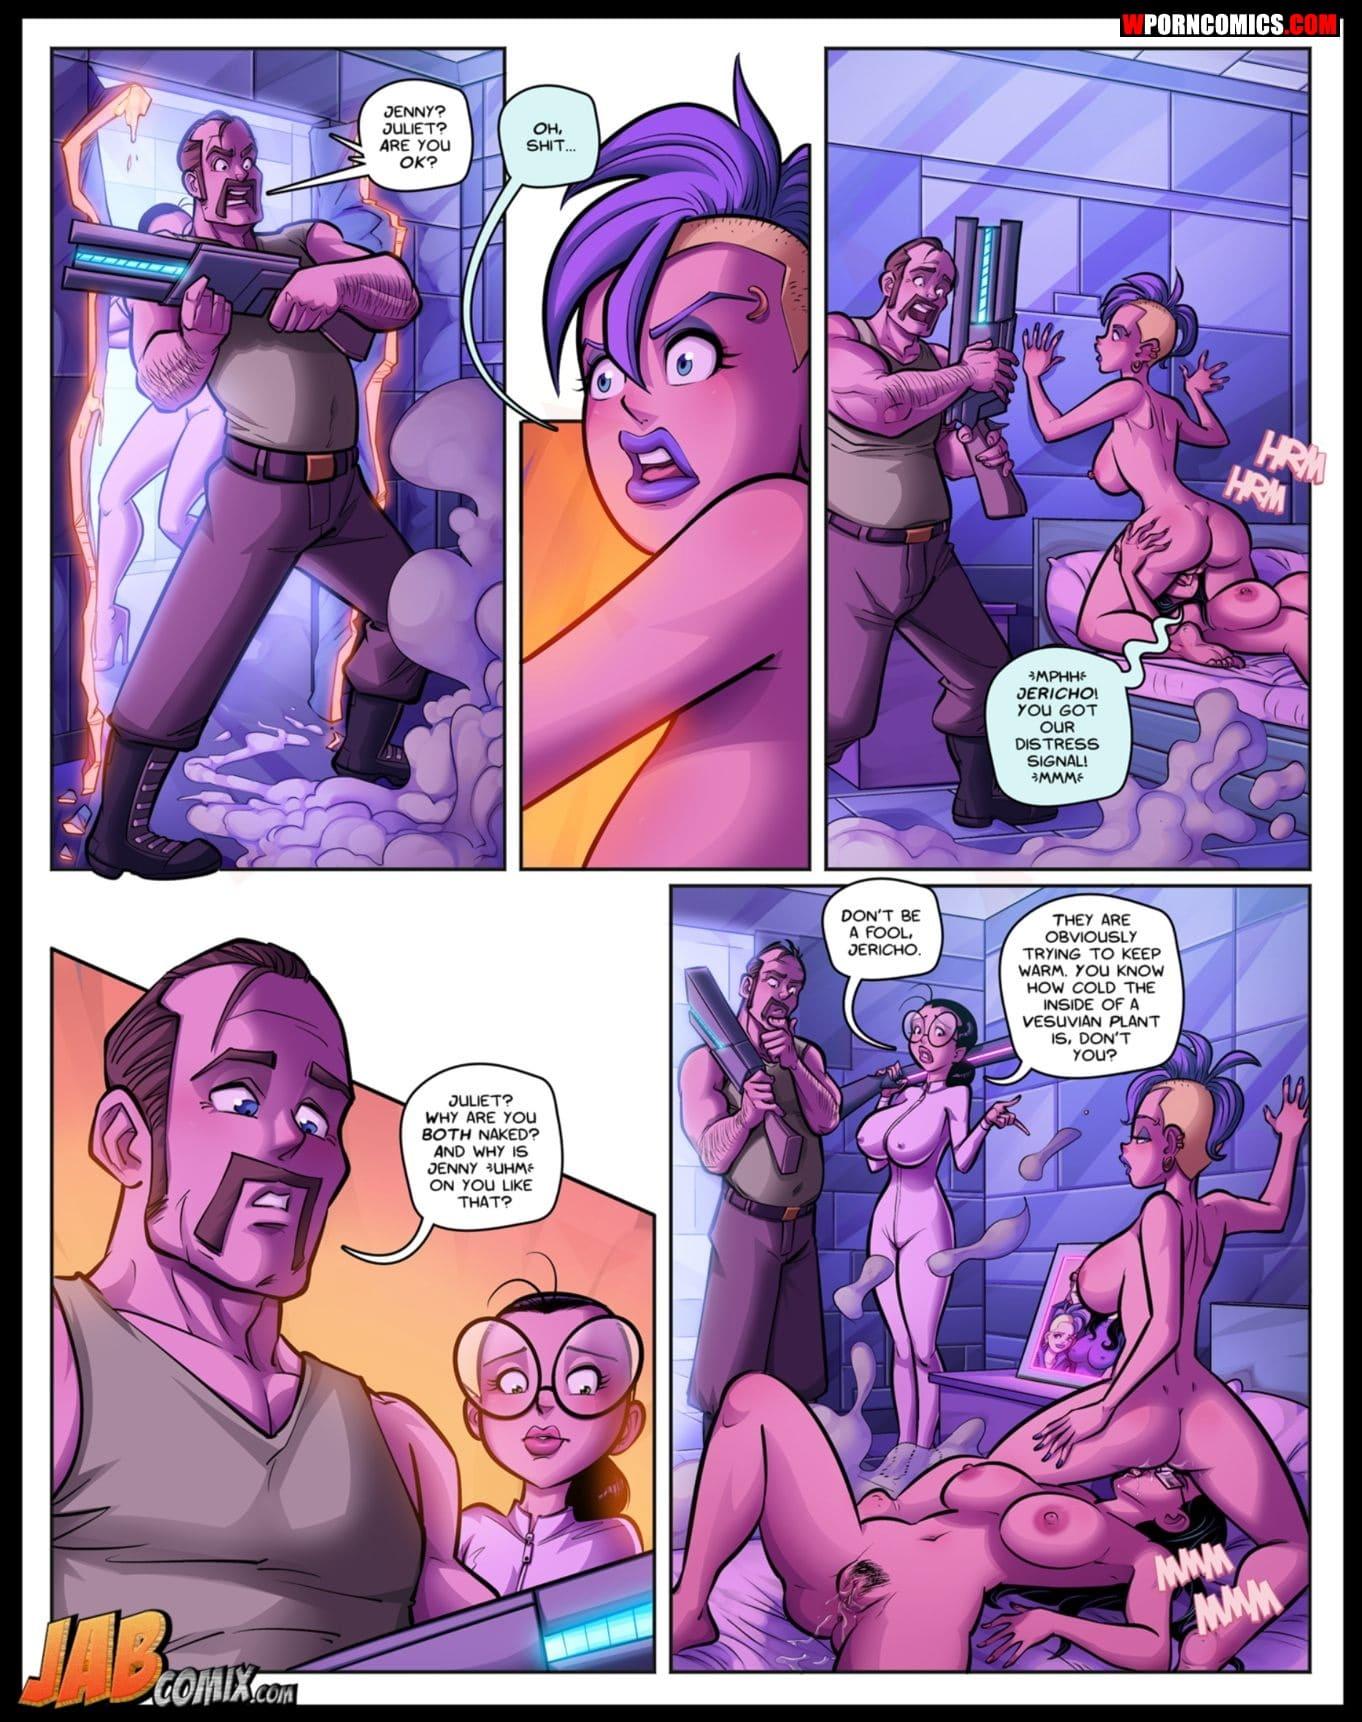 porn-comic-Jenny-Jupiter-part-2-2020-03-11/porn-comic-Jenny-Jupiter-part-2-2020-03-11-34117.jpg